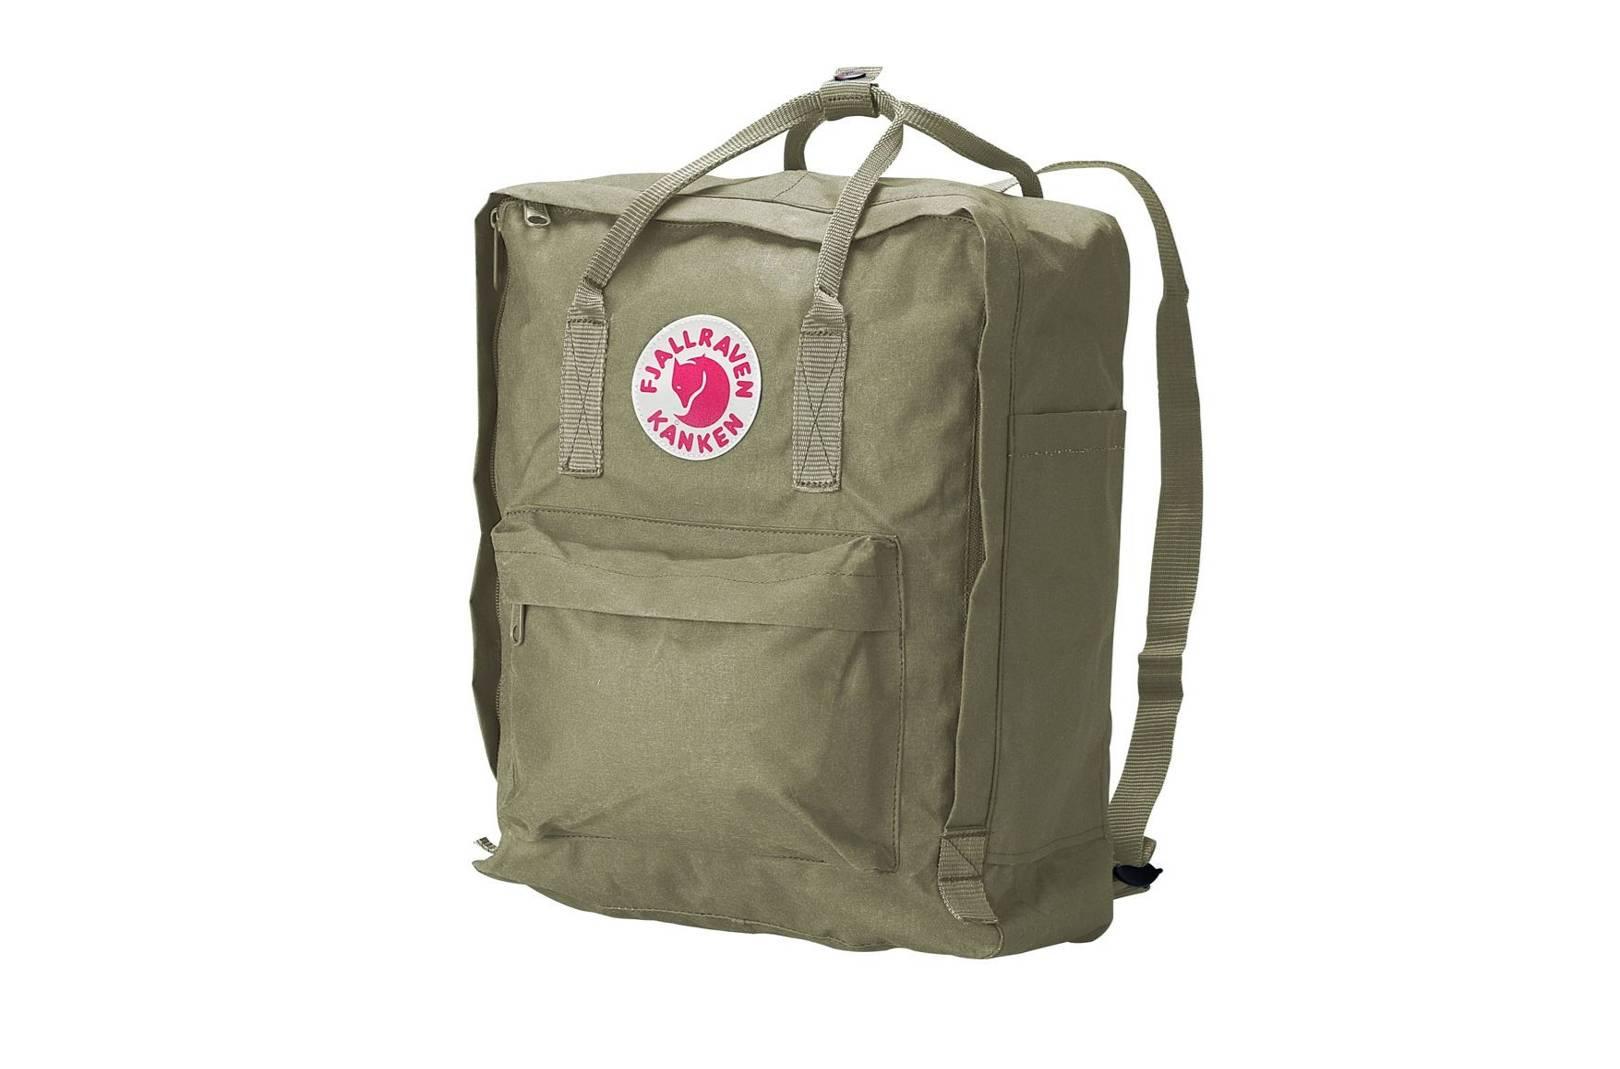 4a118c5a89a595 Fjällräven Kånken backpack: Too cool for school | British GQ